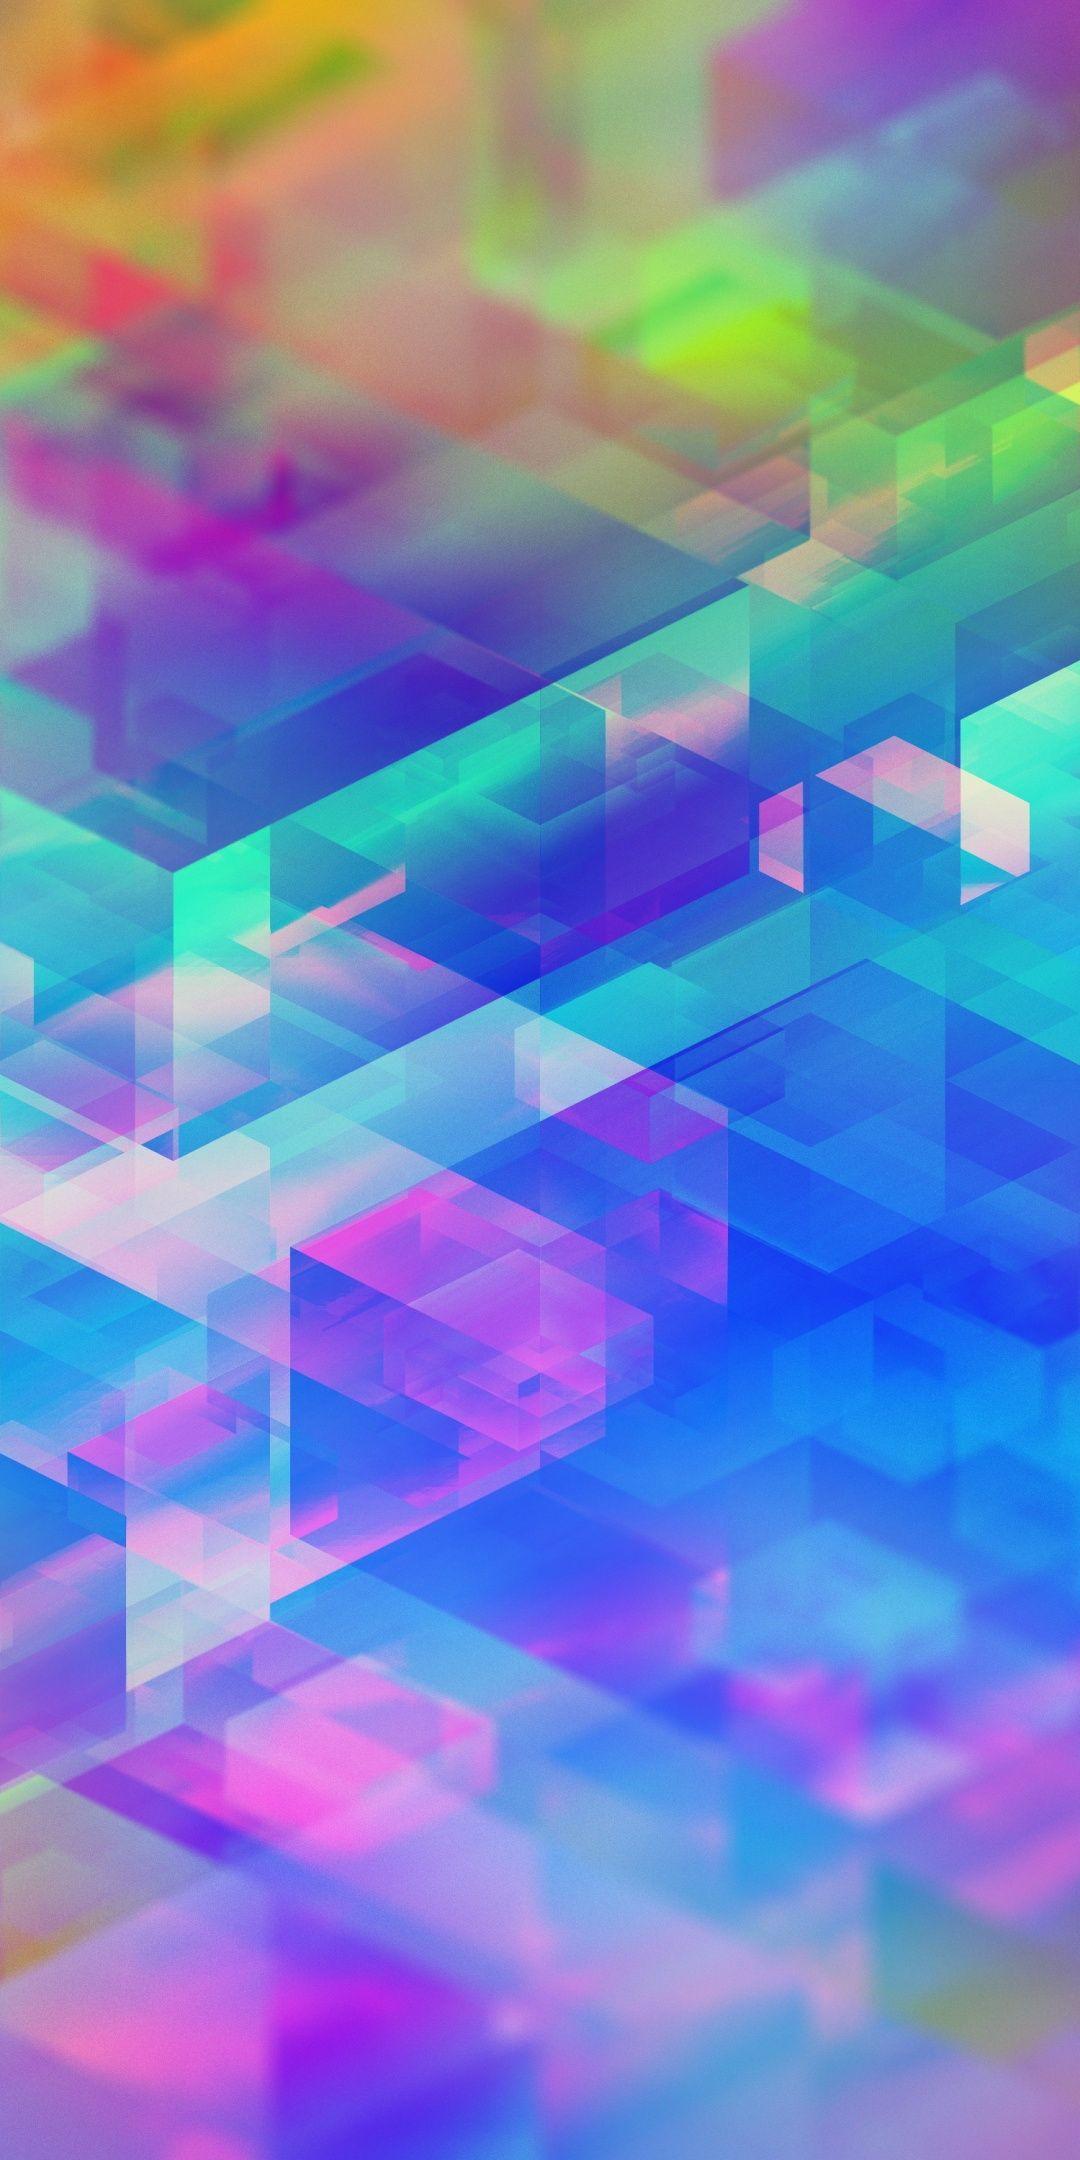 Colorful Rainbow Geometric Pattern 1080x2160 Wallpaper Wallpaper Iphone Neon Iphone Wallpaper Blur Rainbow Wallpaper